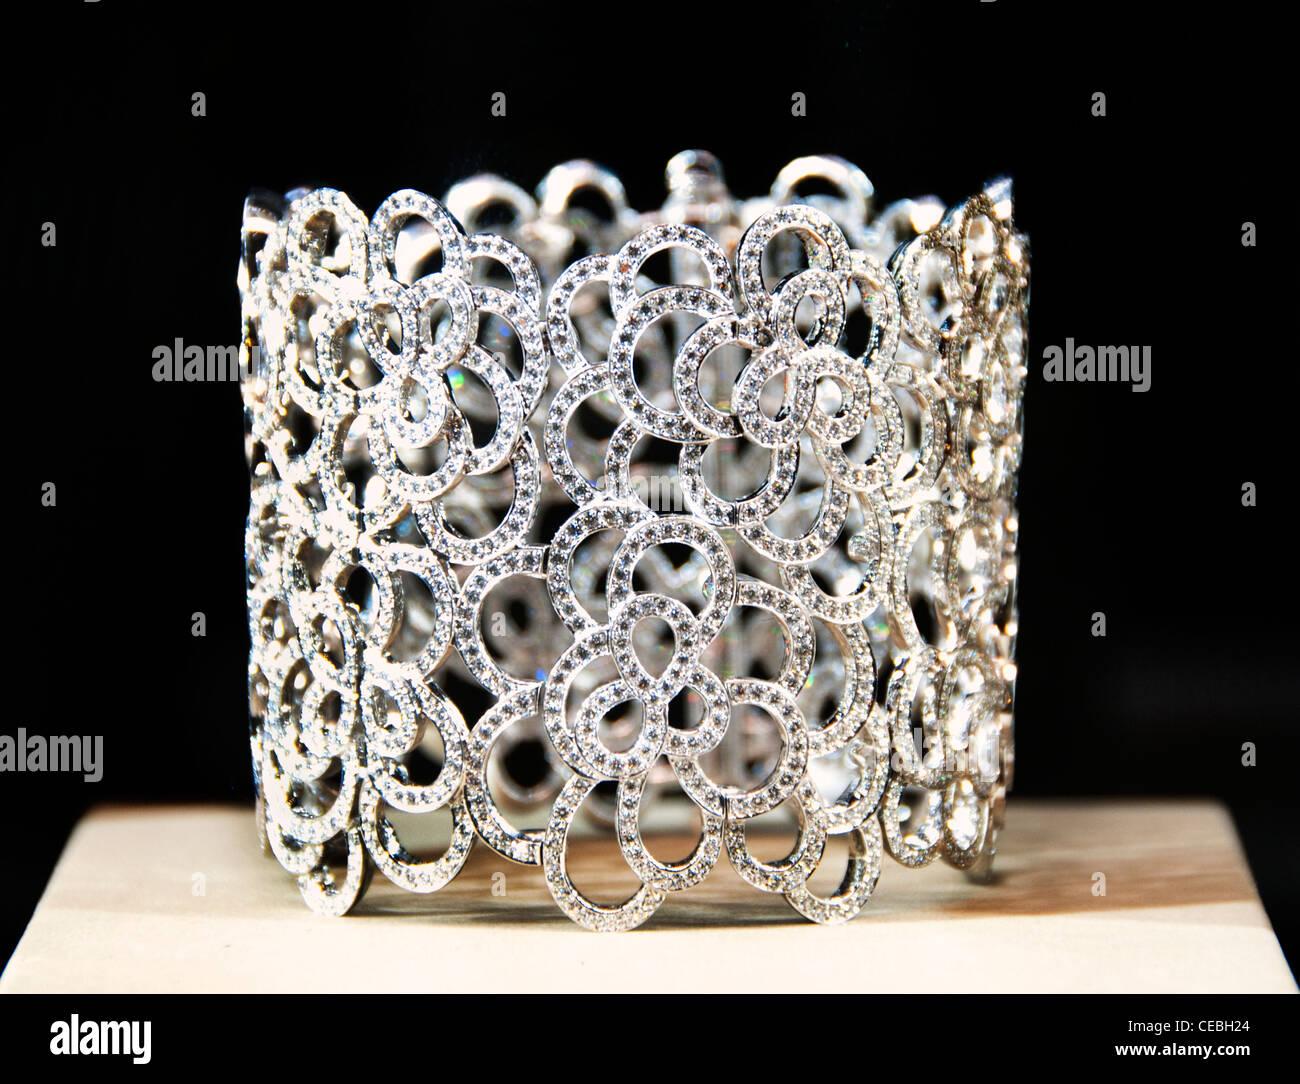 Chanel Place Vendome Jeweler Jewel Paris France - Stock Image